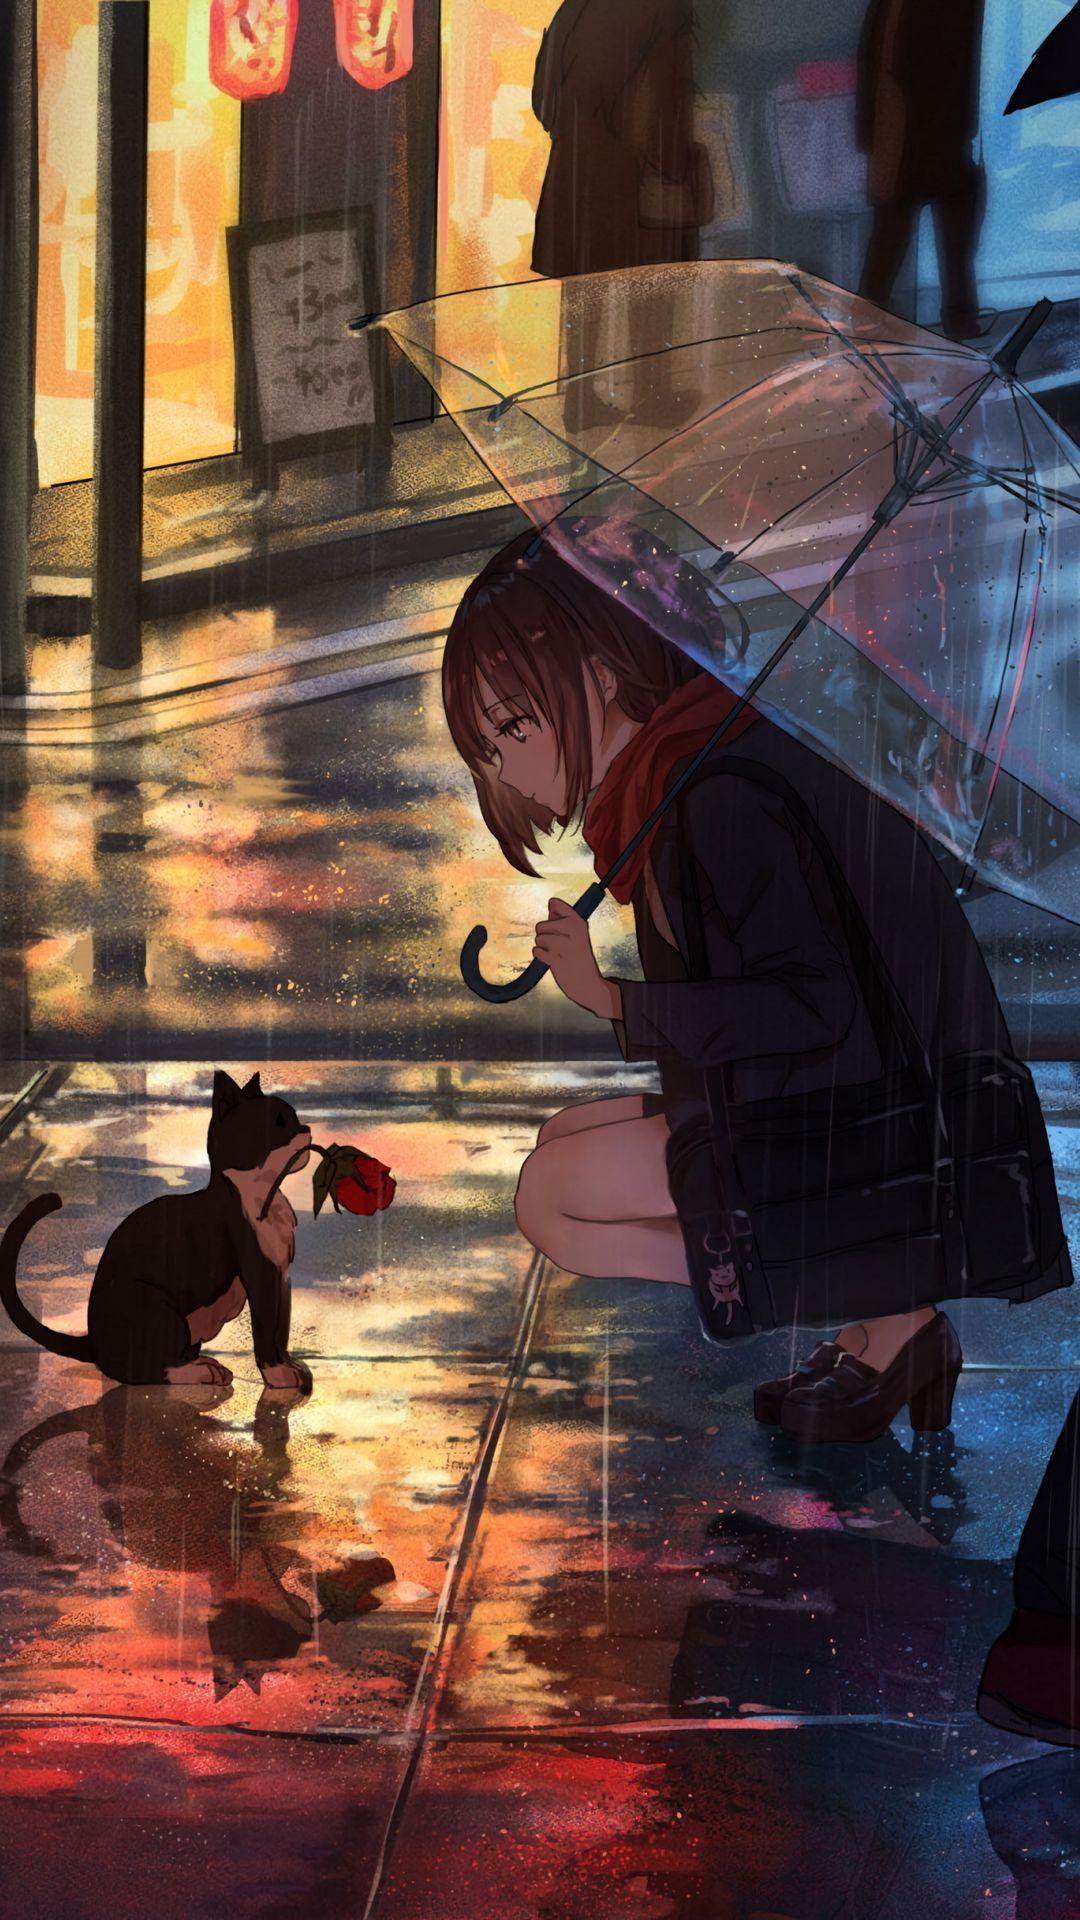 Download wallpaper 1080x1920 girl, kitten, flower, anime, street, rain samsung galaxy s4, s5, note, sony xperia z, z1, z2, z3, htc one, lenovo vibe hd background